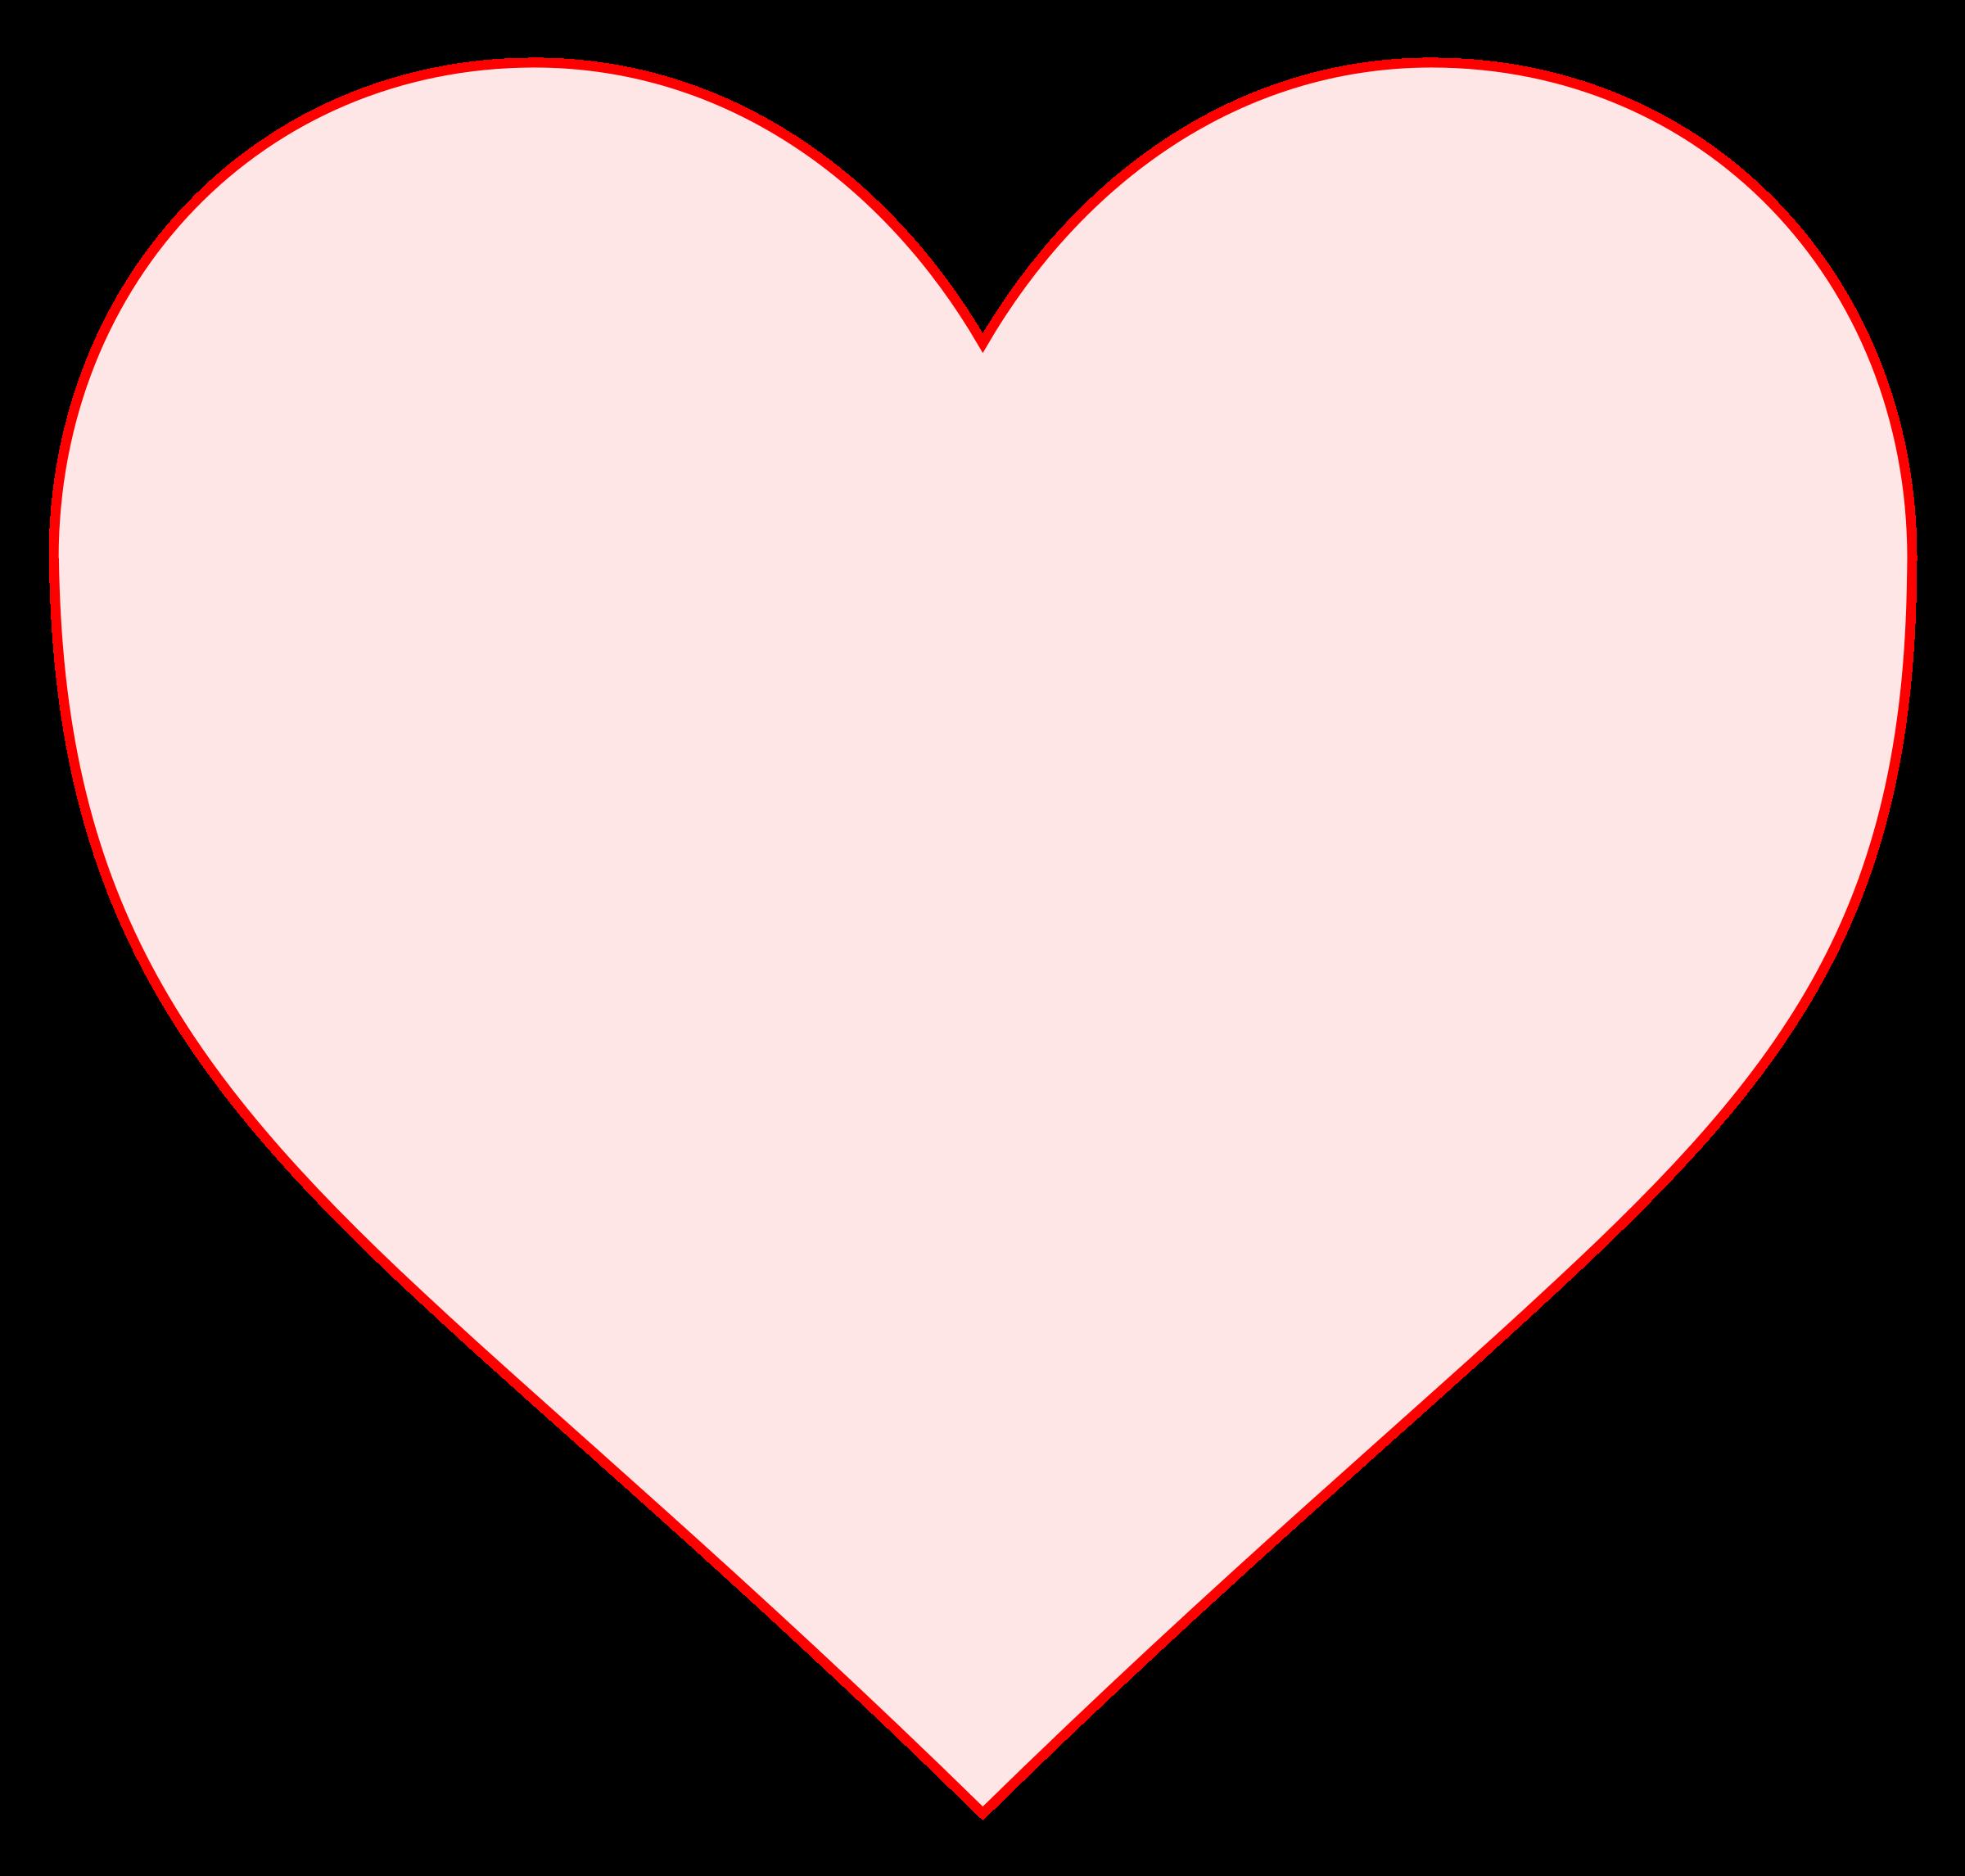 Clipart kids heart. Pink big image png